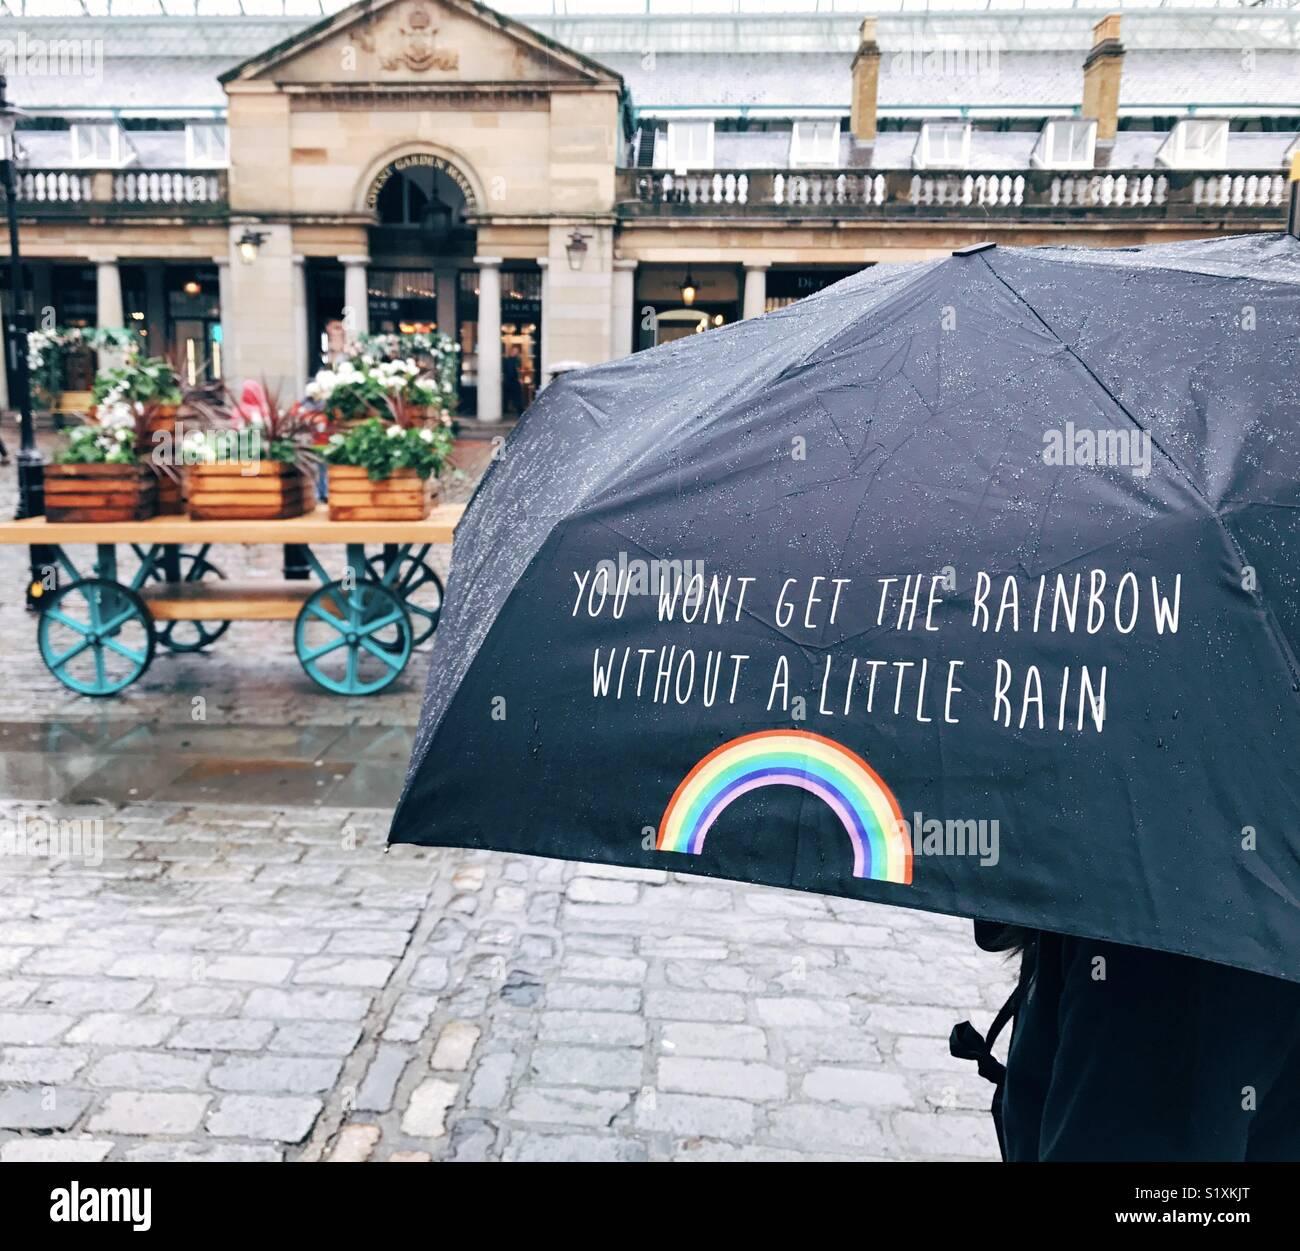 Covent Garden Photo Stock